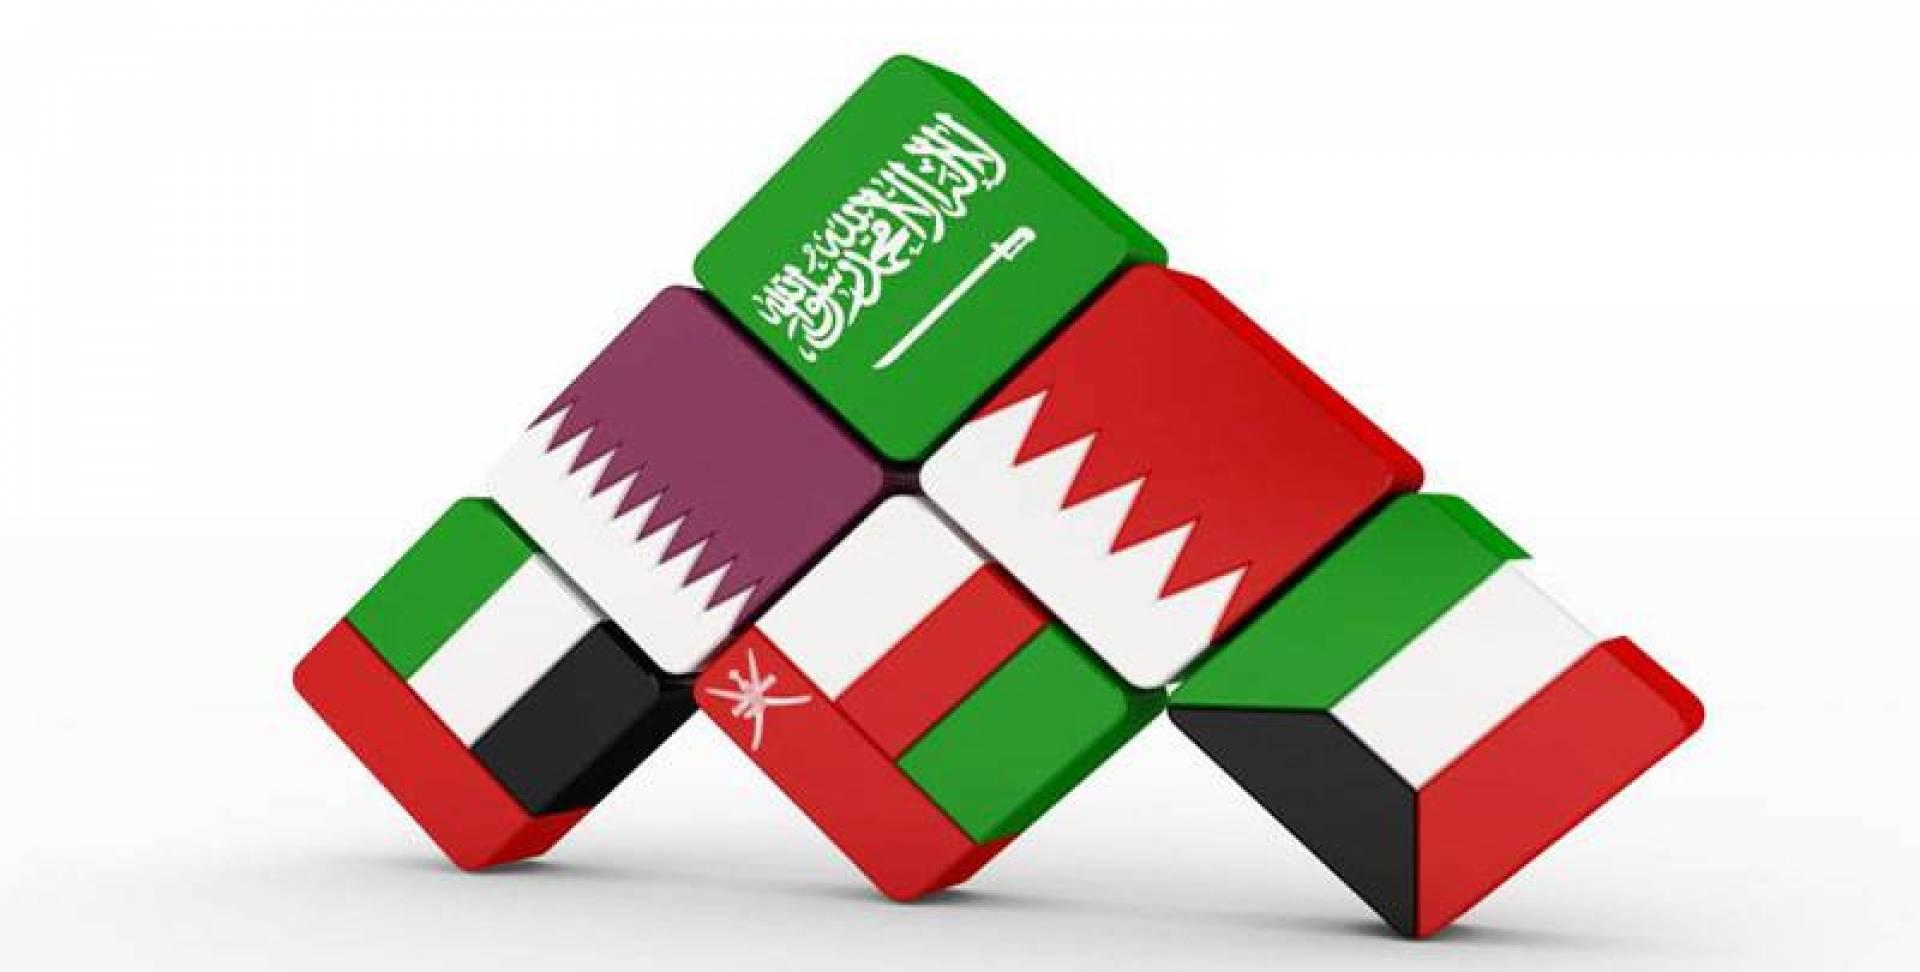 «HSBC»: مبادرات كويتية تعزِّز الانتعاش والنمو